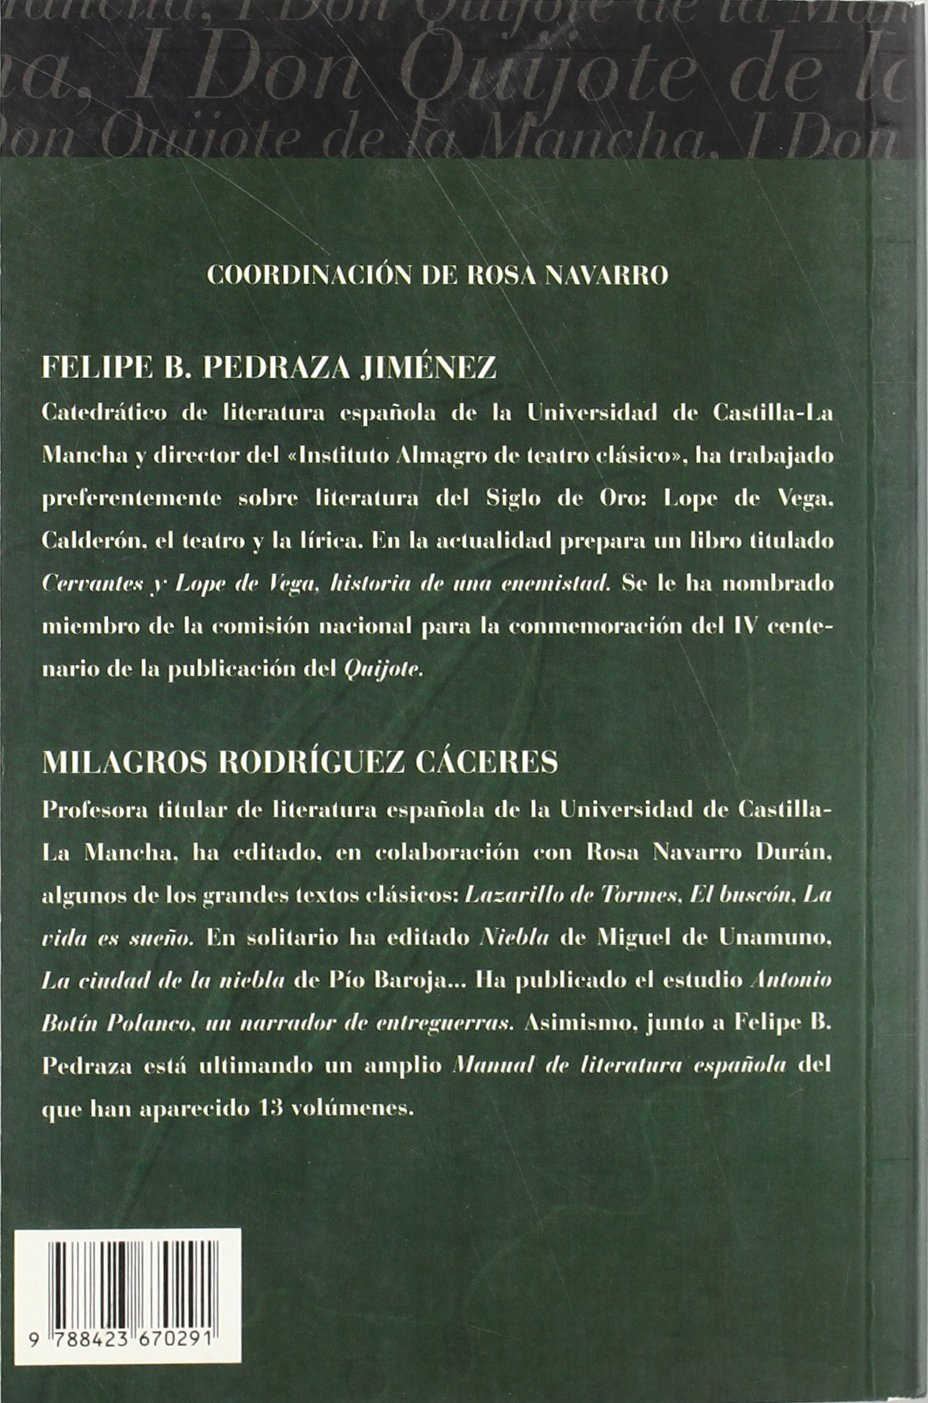 Amazon.com: Don Quijote de la mancha / Don Quixote (clasicos edebe / Edebe Classics) (Spanish Edition) (9788423670291): Miguel de Cervantes Saavedra, ...